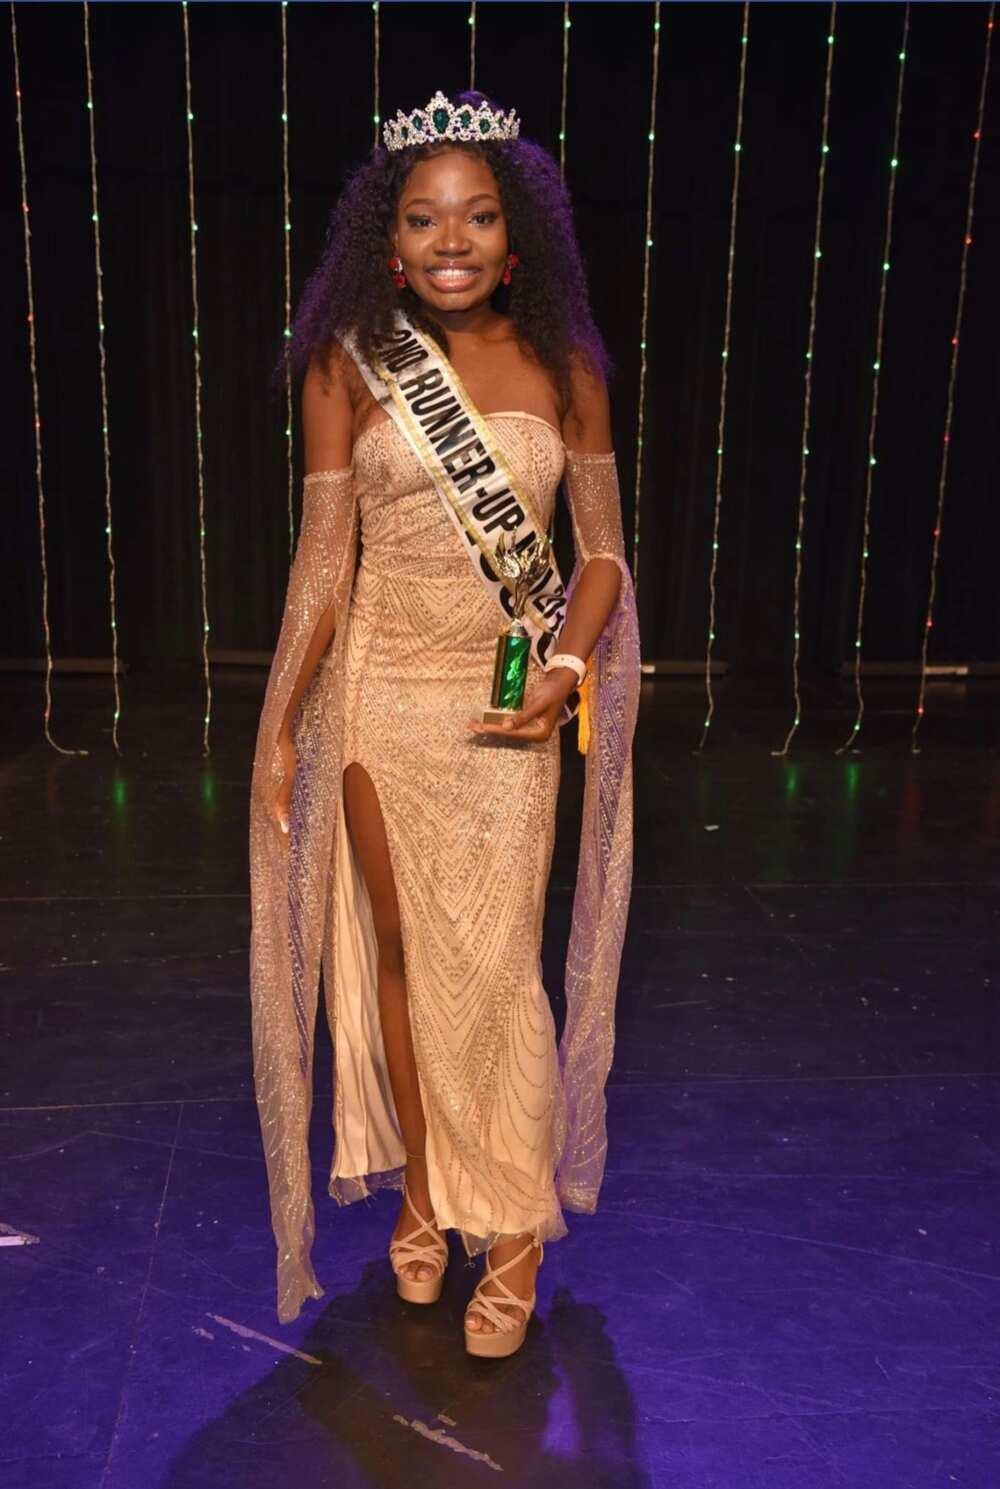 Details of how Najeebat Sule, Nigerian Beauty Queen, was Murdered in US Emerge